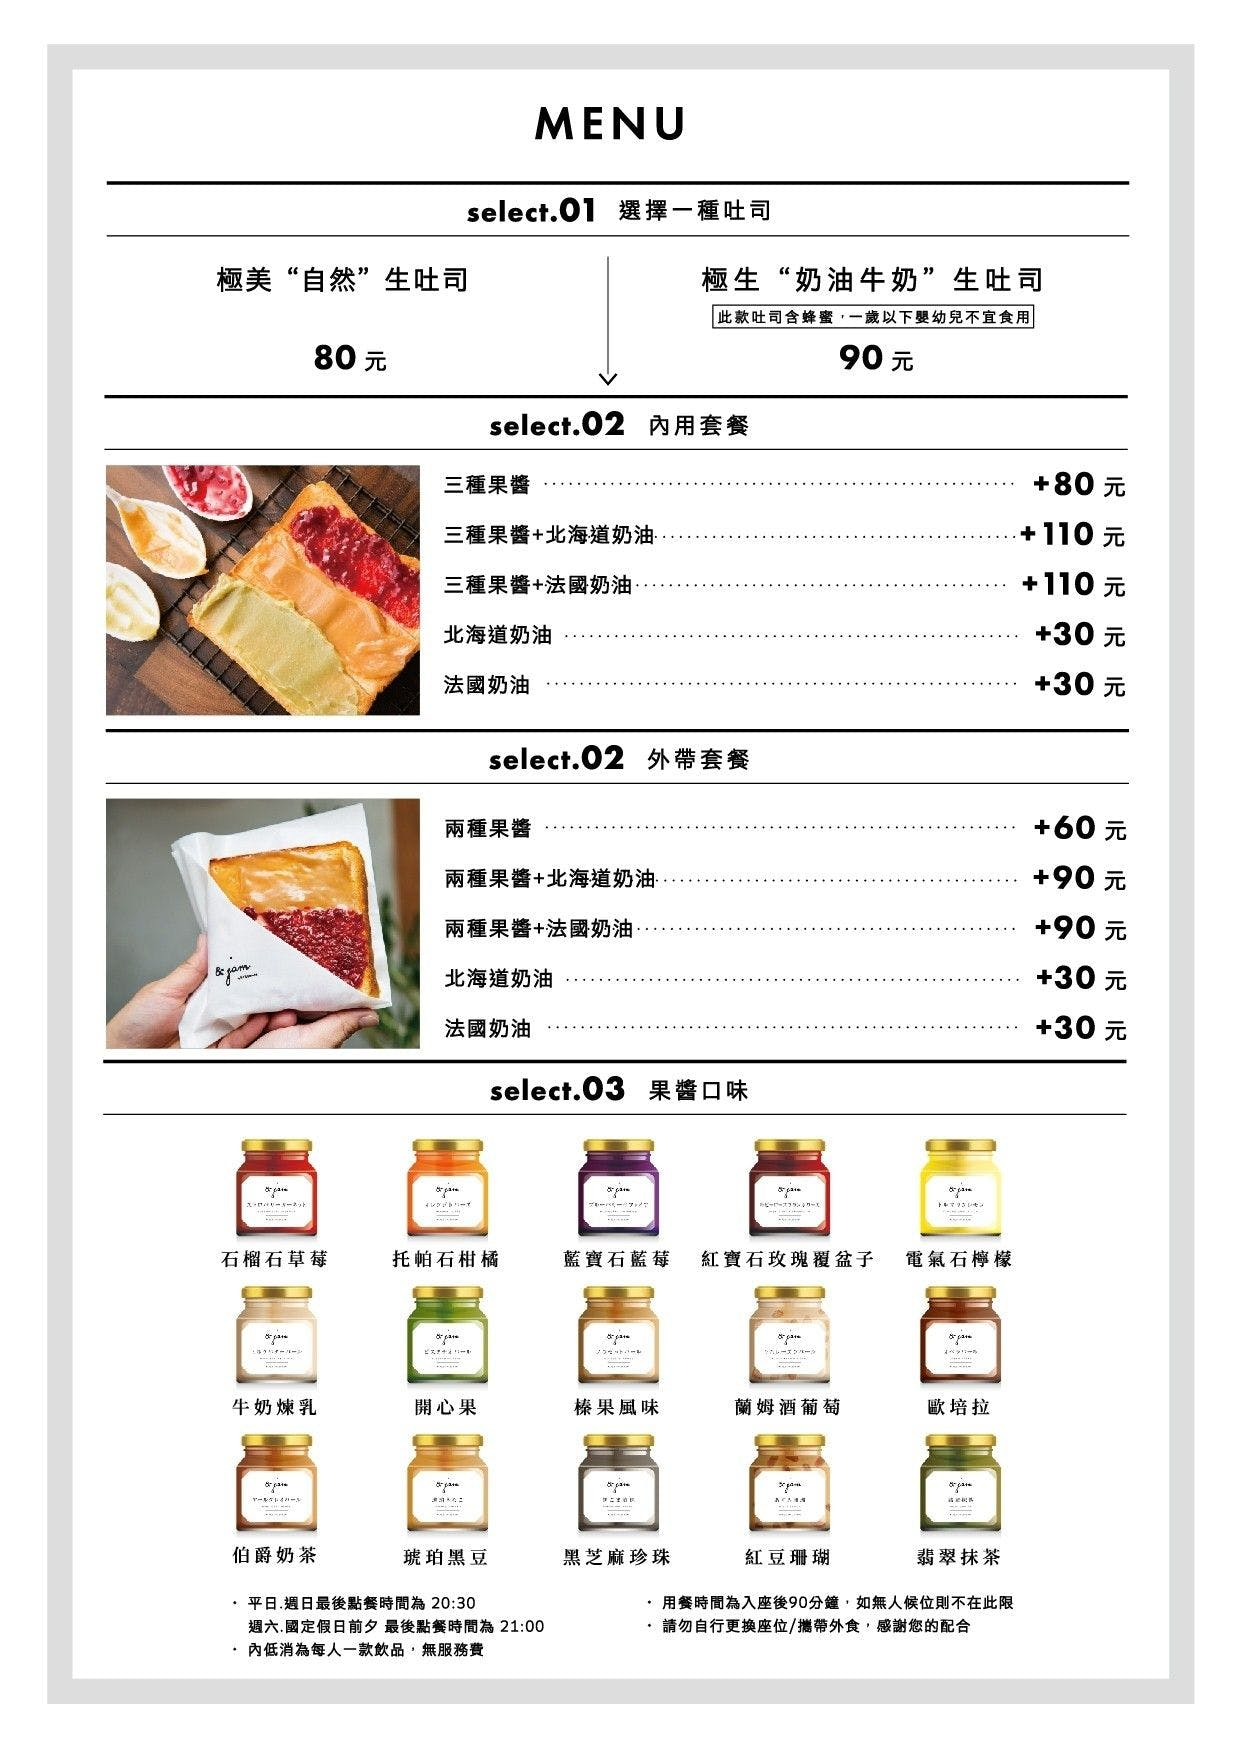 SAKImoto Bakery 嵜本高級生吐司專門店菜單MENU